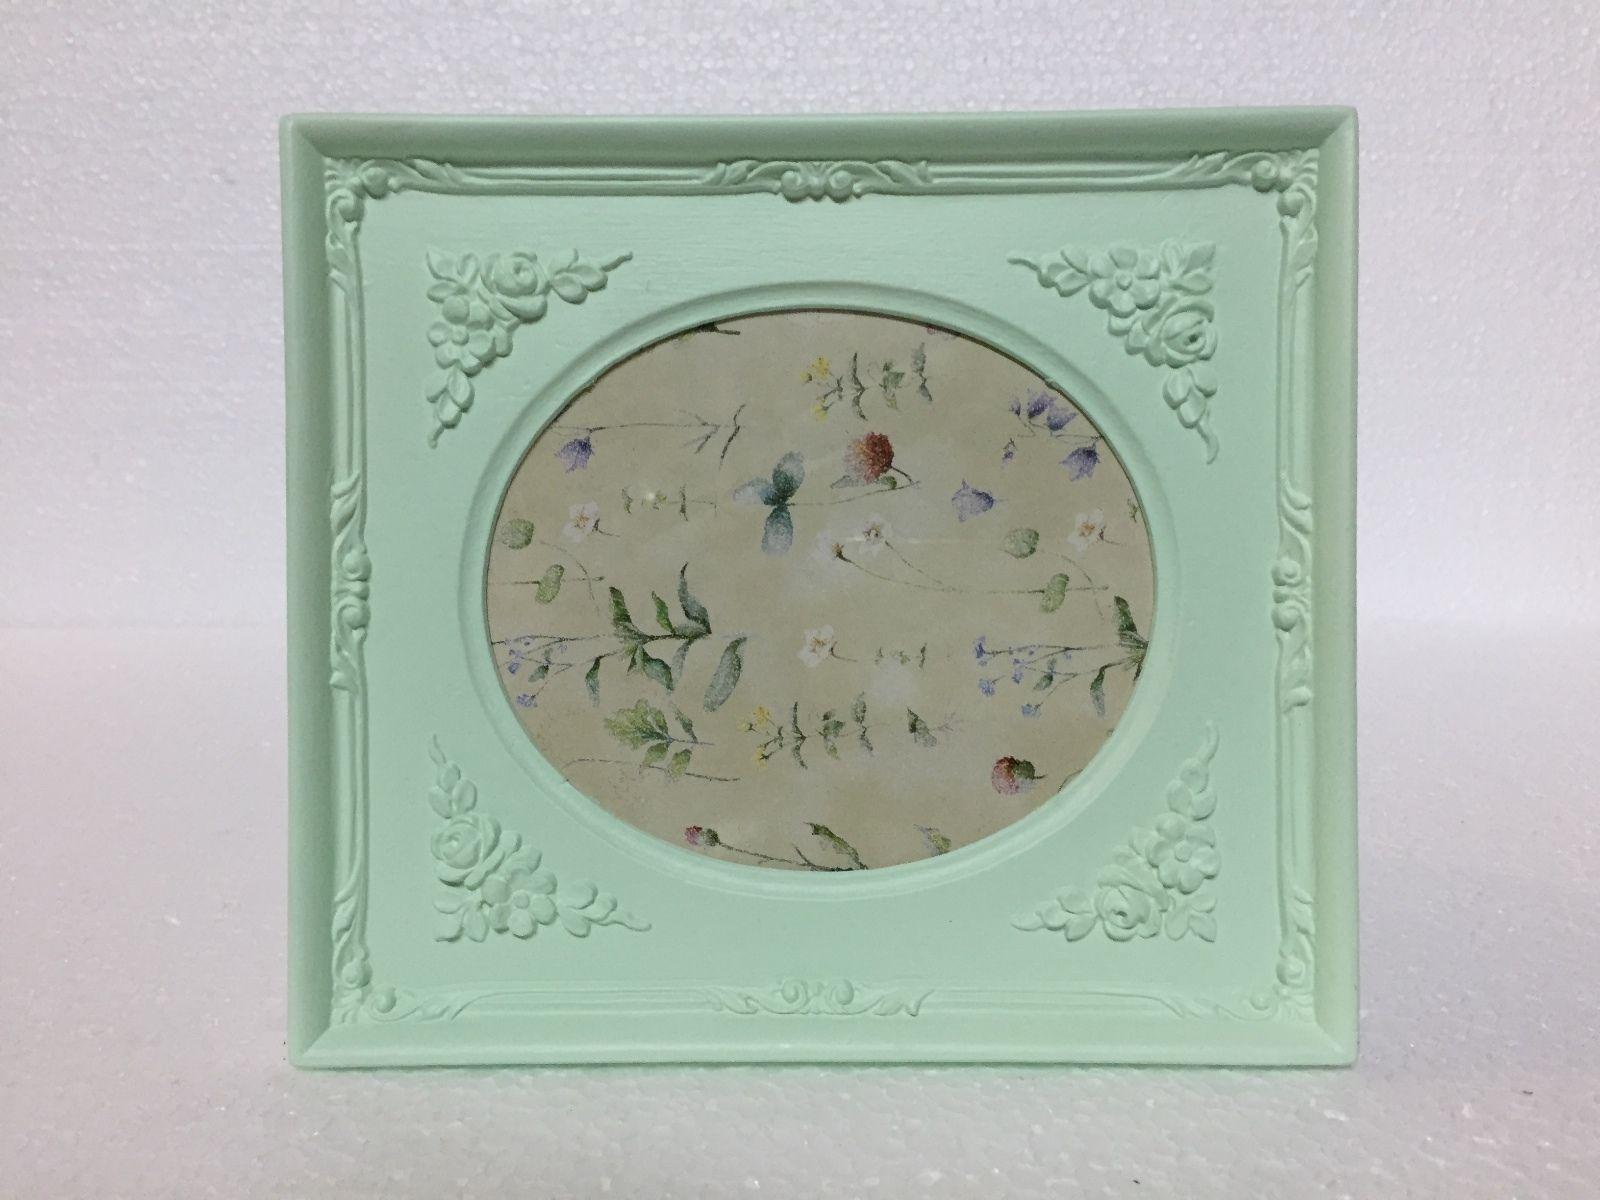 Bilderrahmen Mint Grün 19x17 Antik Barockrahmen oval rechteckig ...